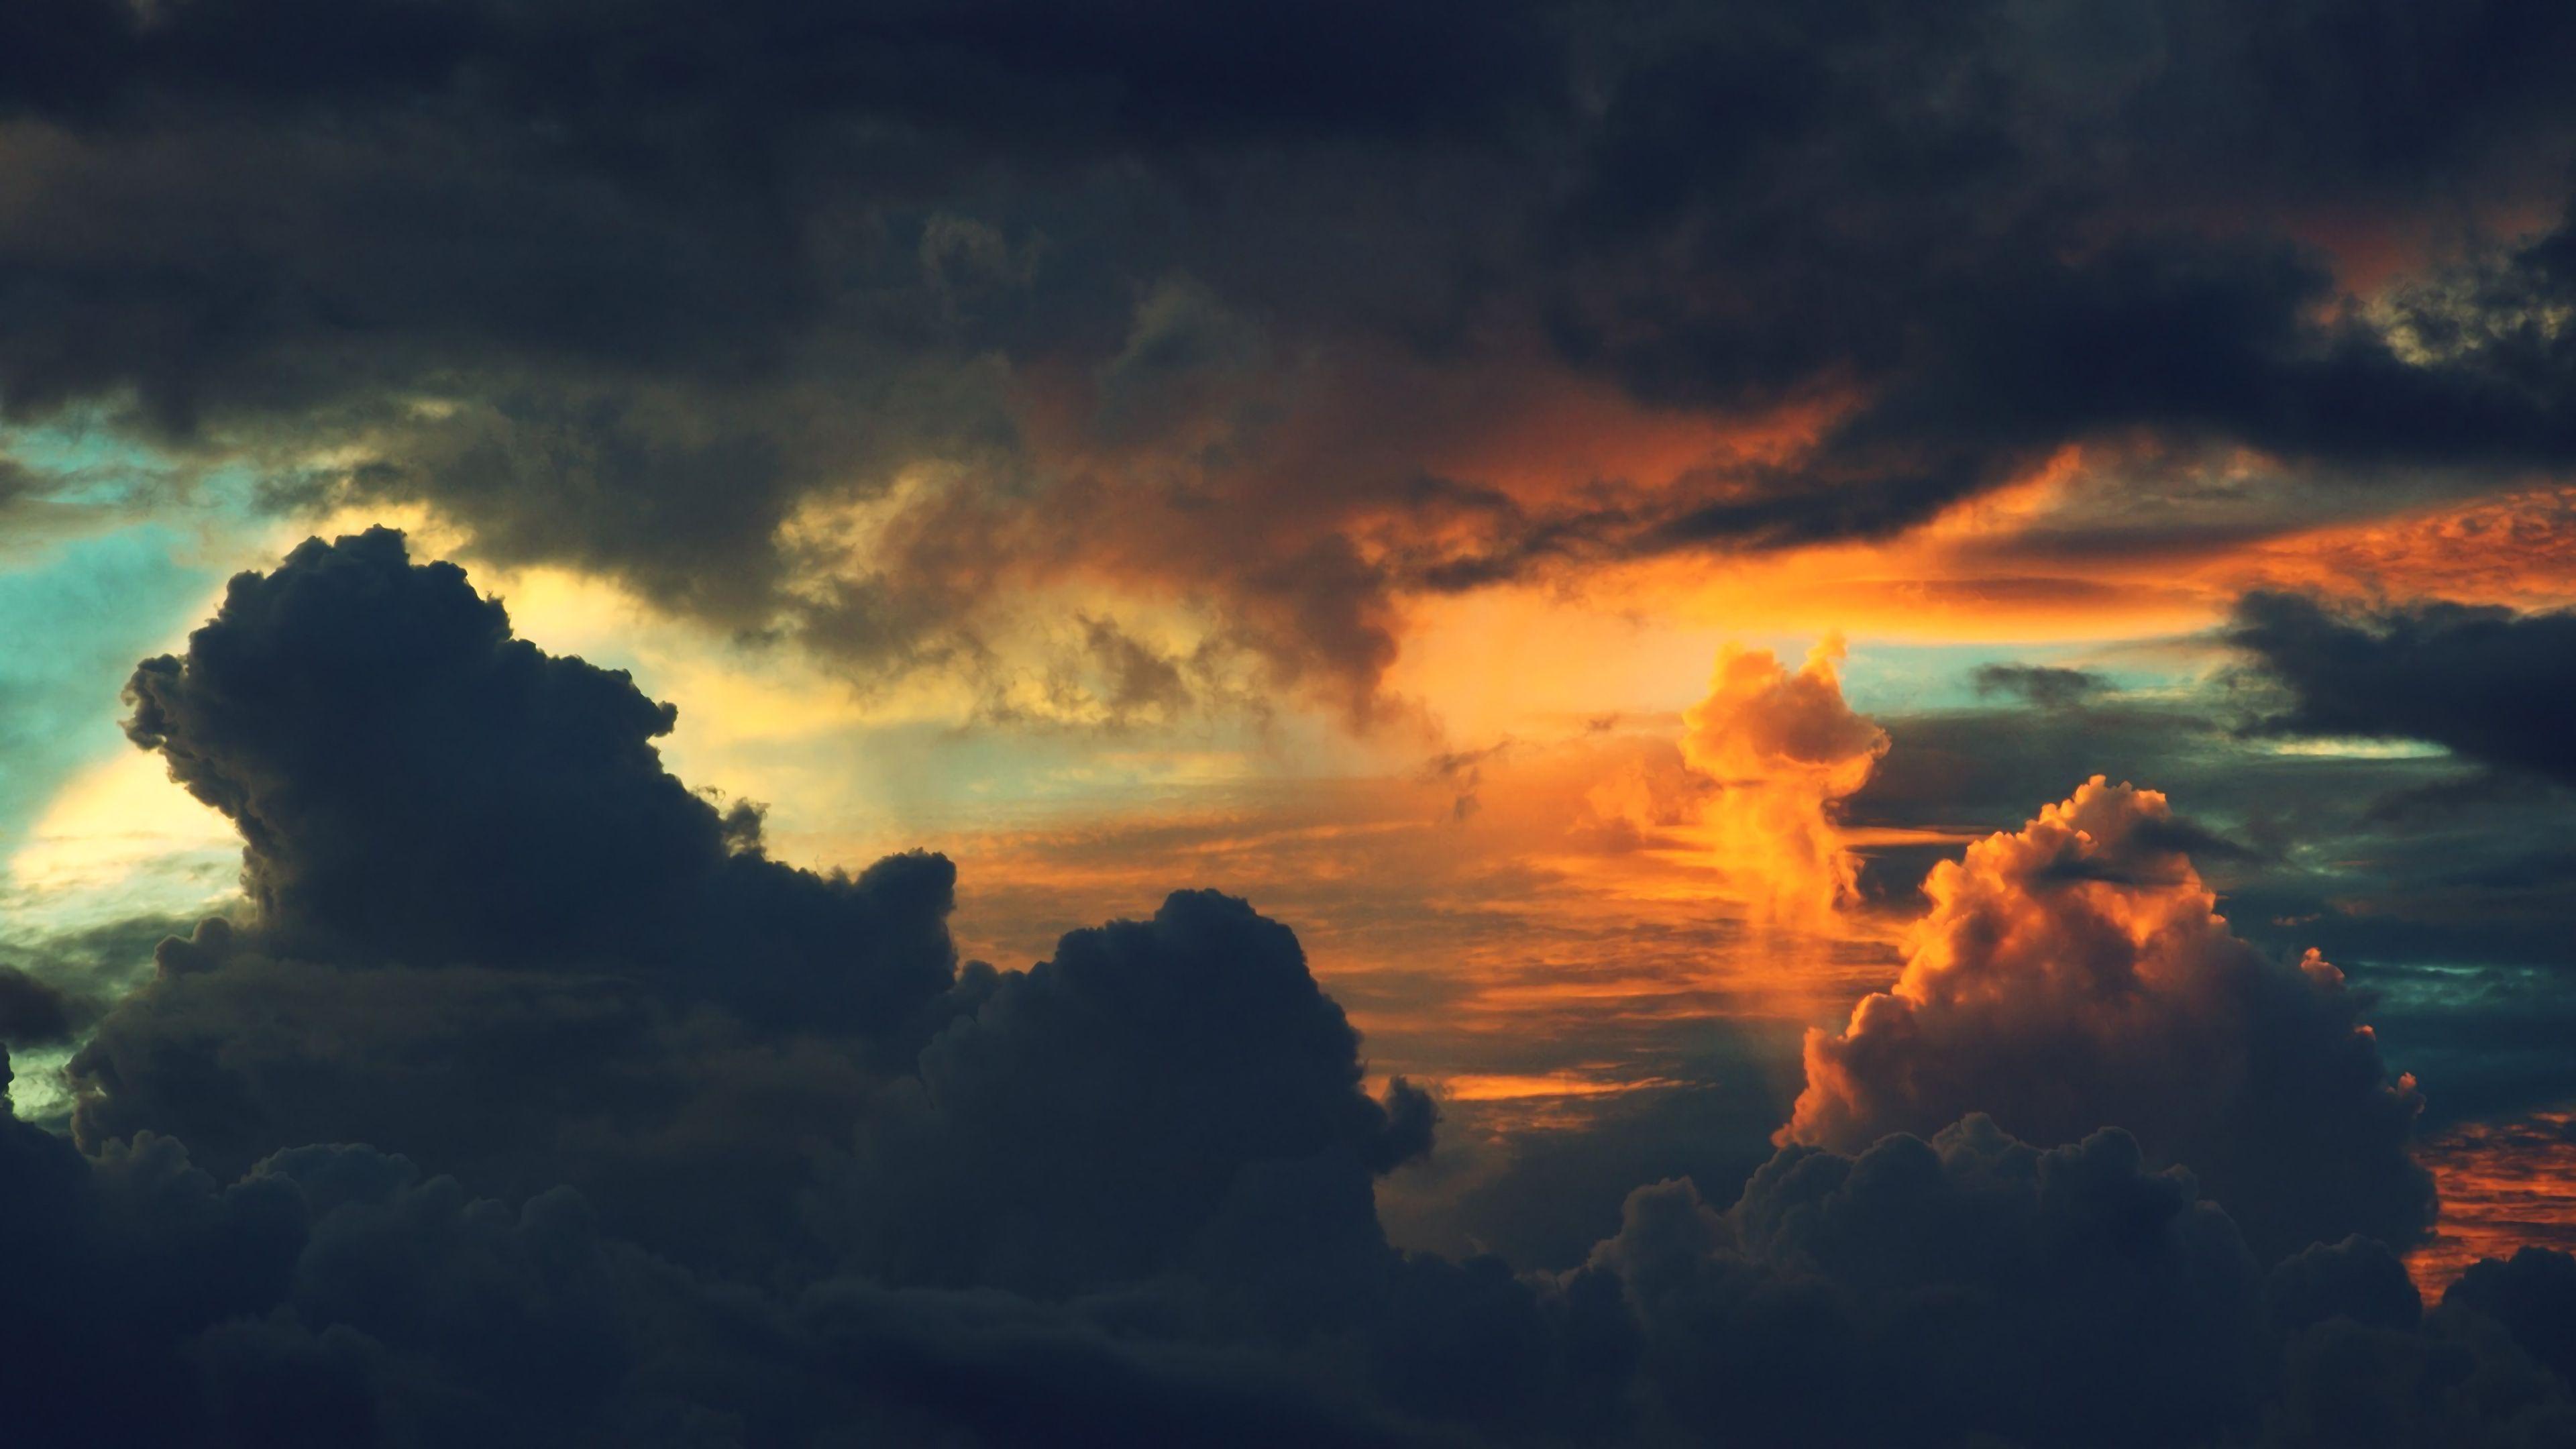 Wallpaper 4k Sky Clouds 4k 4k Wallpapers Clouds Wallpapers Hd